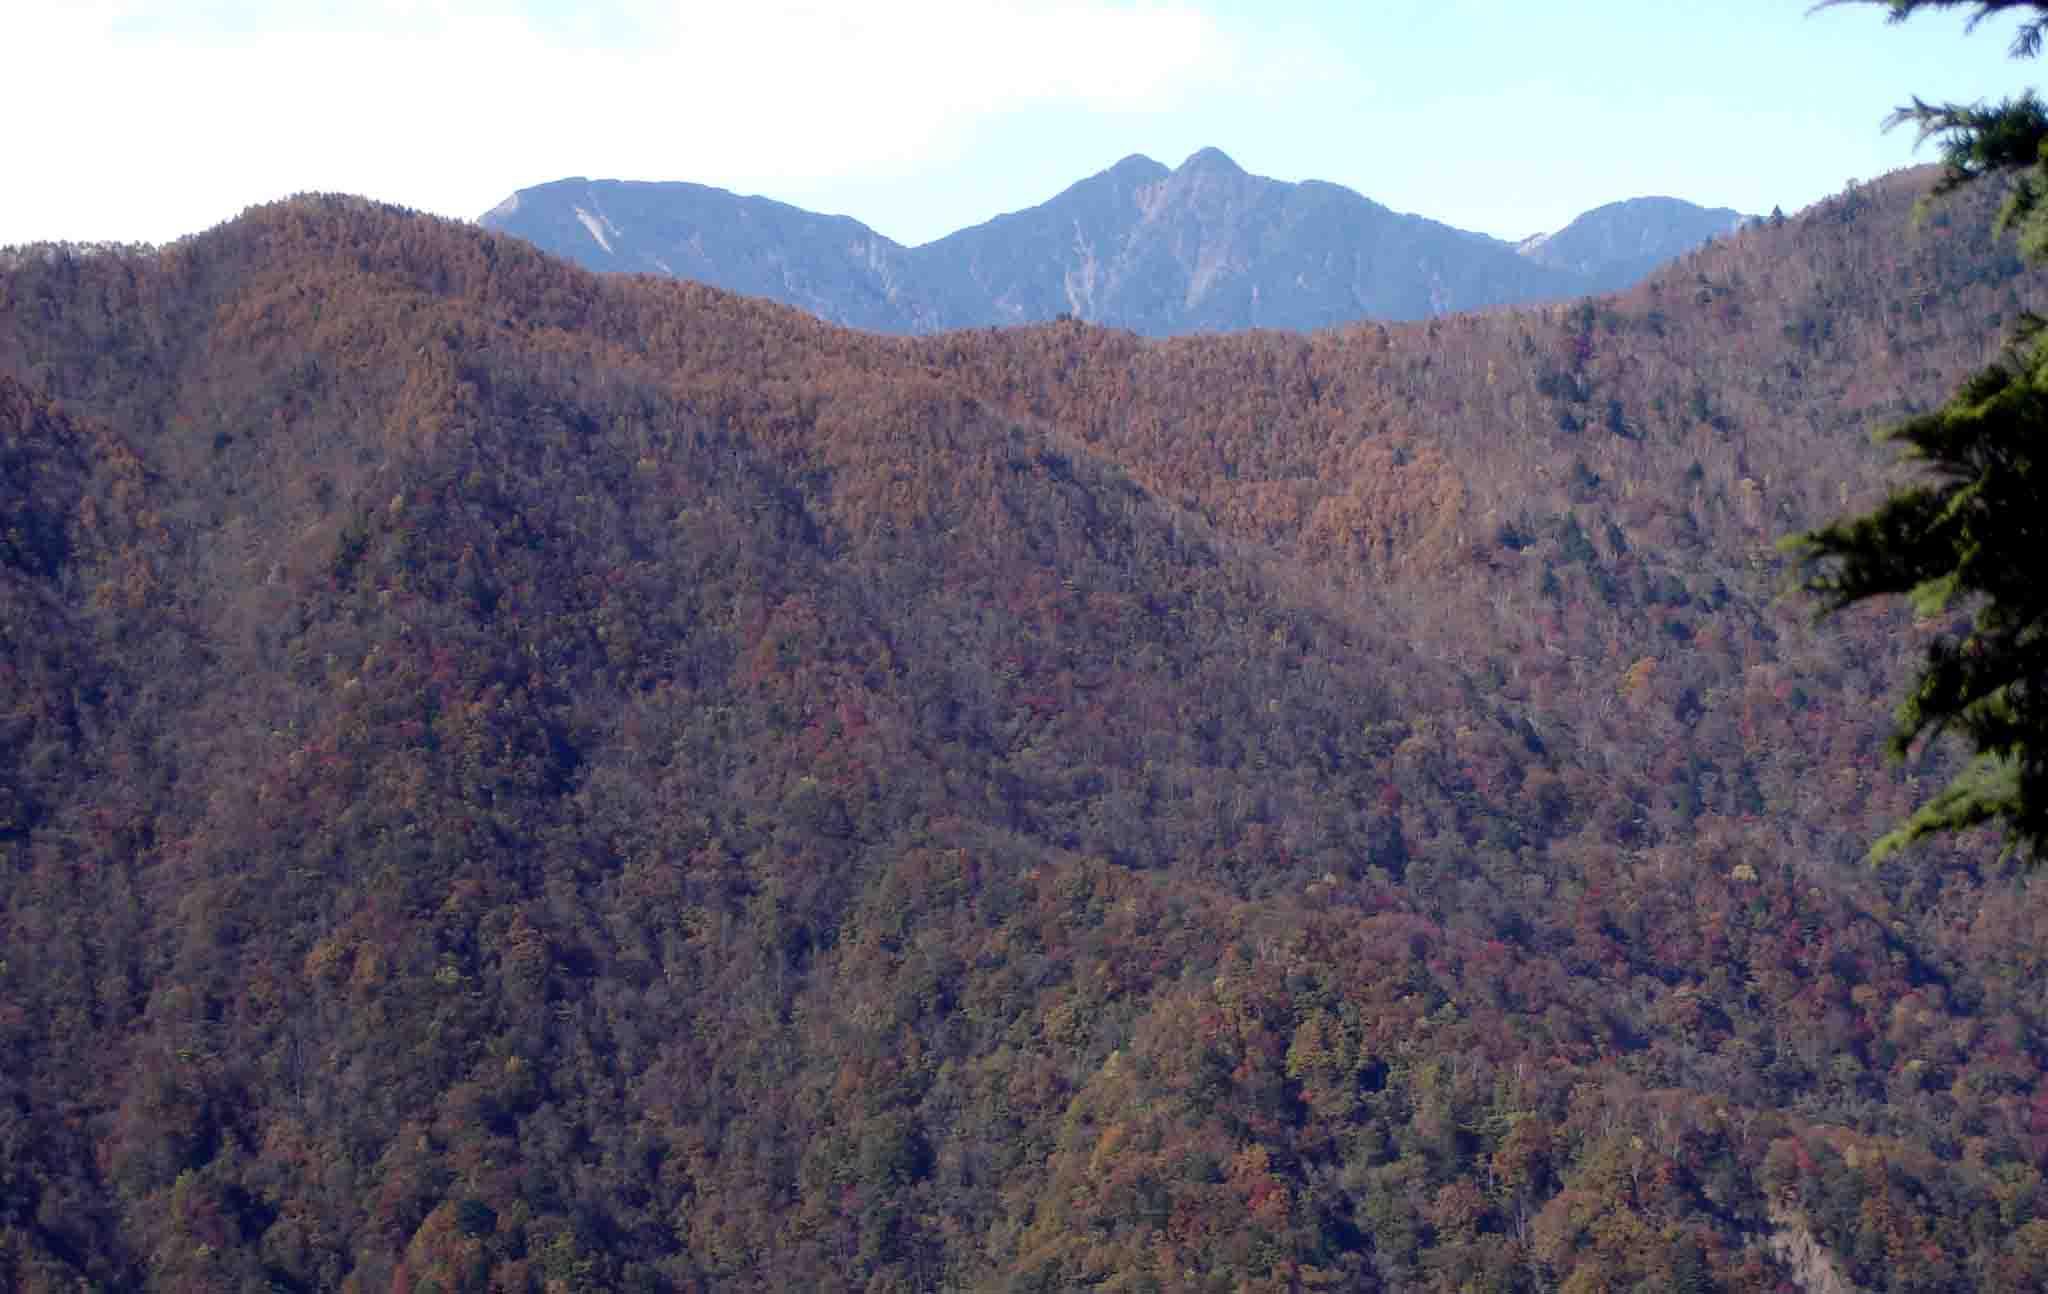 DSC01564 バラの段付近から笊ヶ岳と七面山への尾根